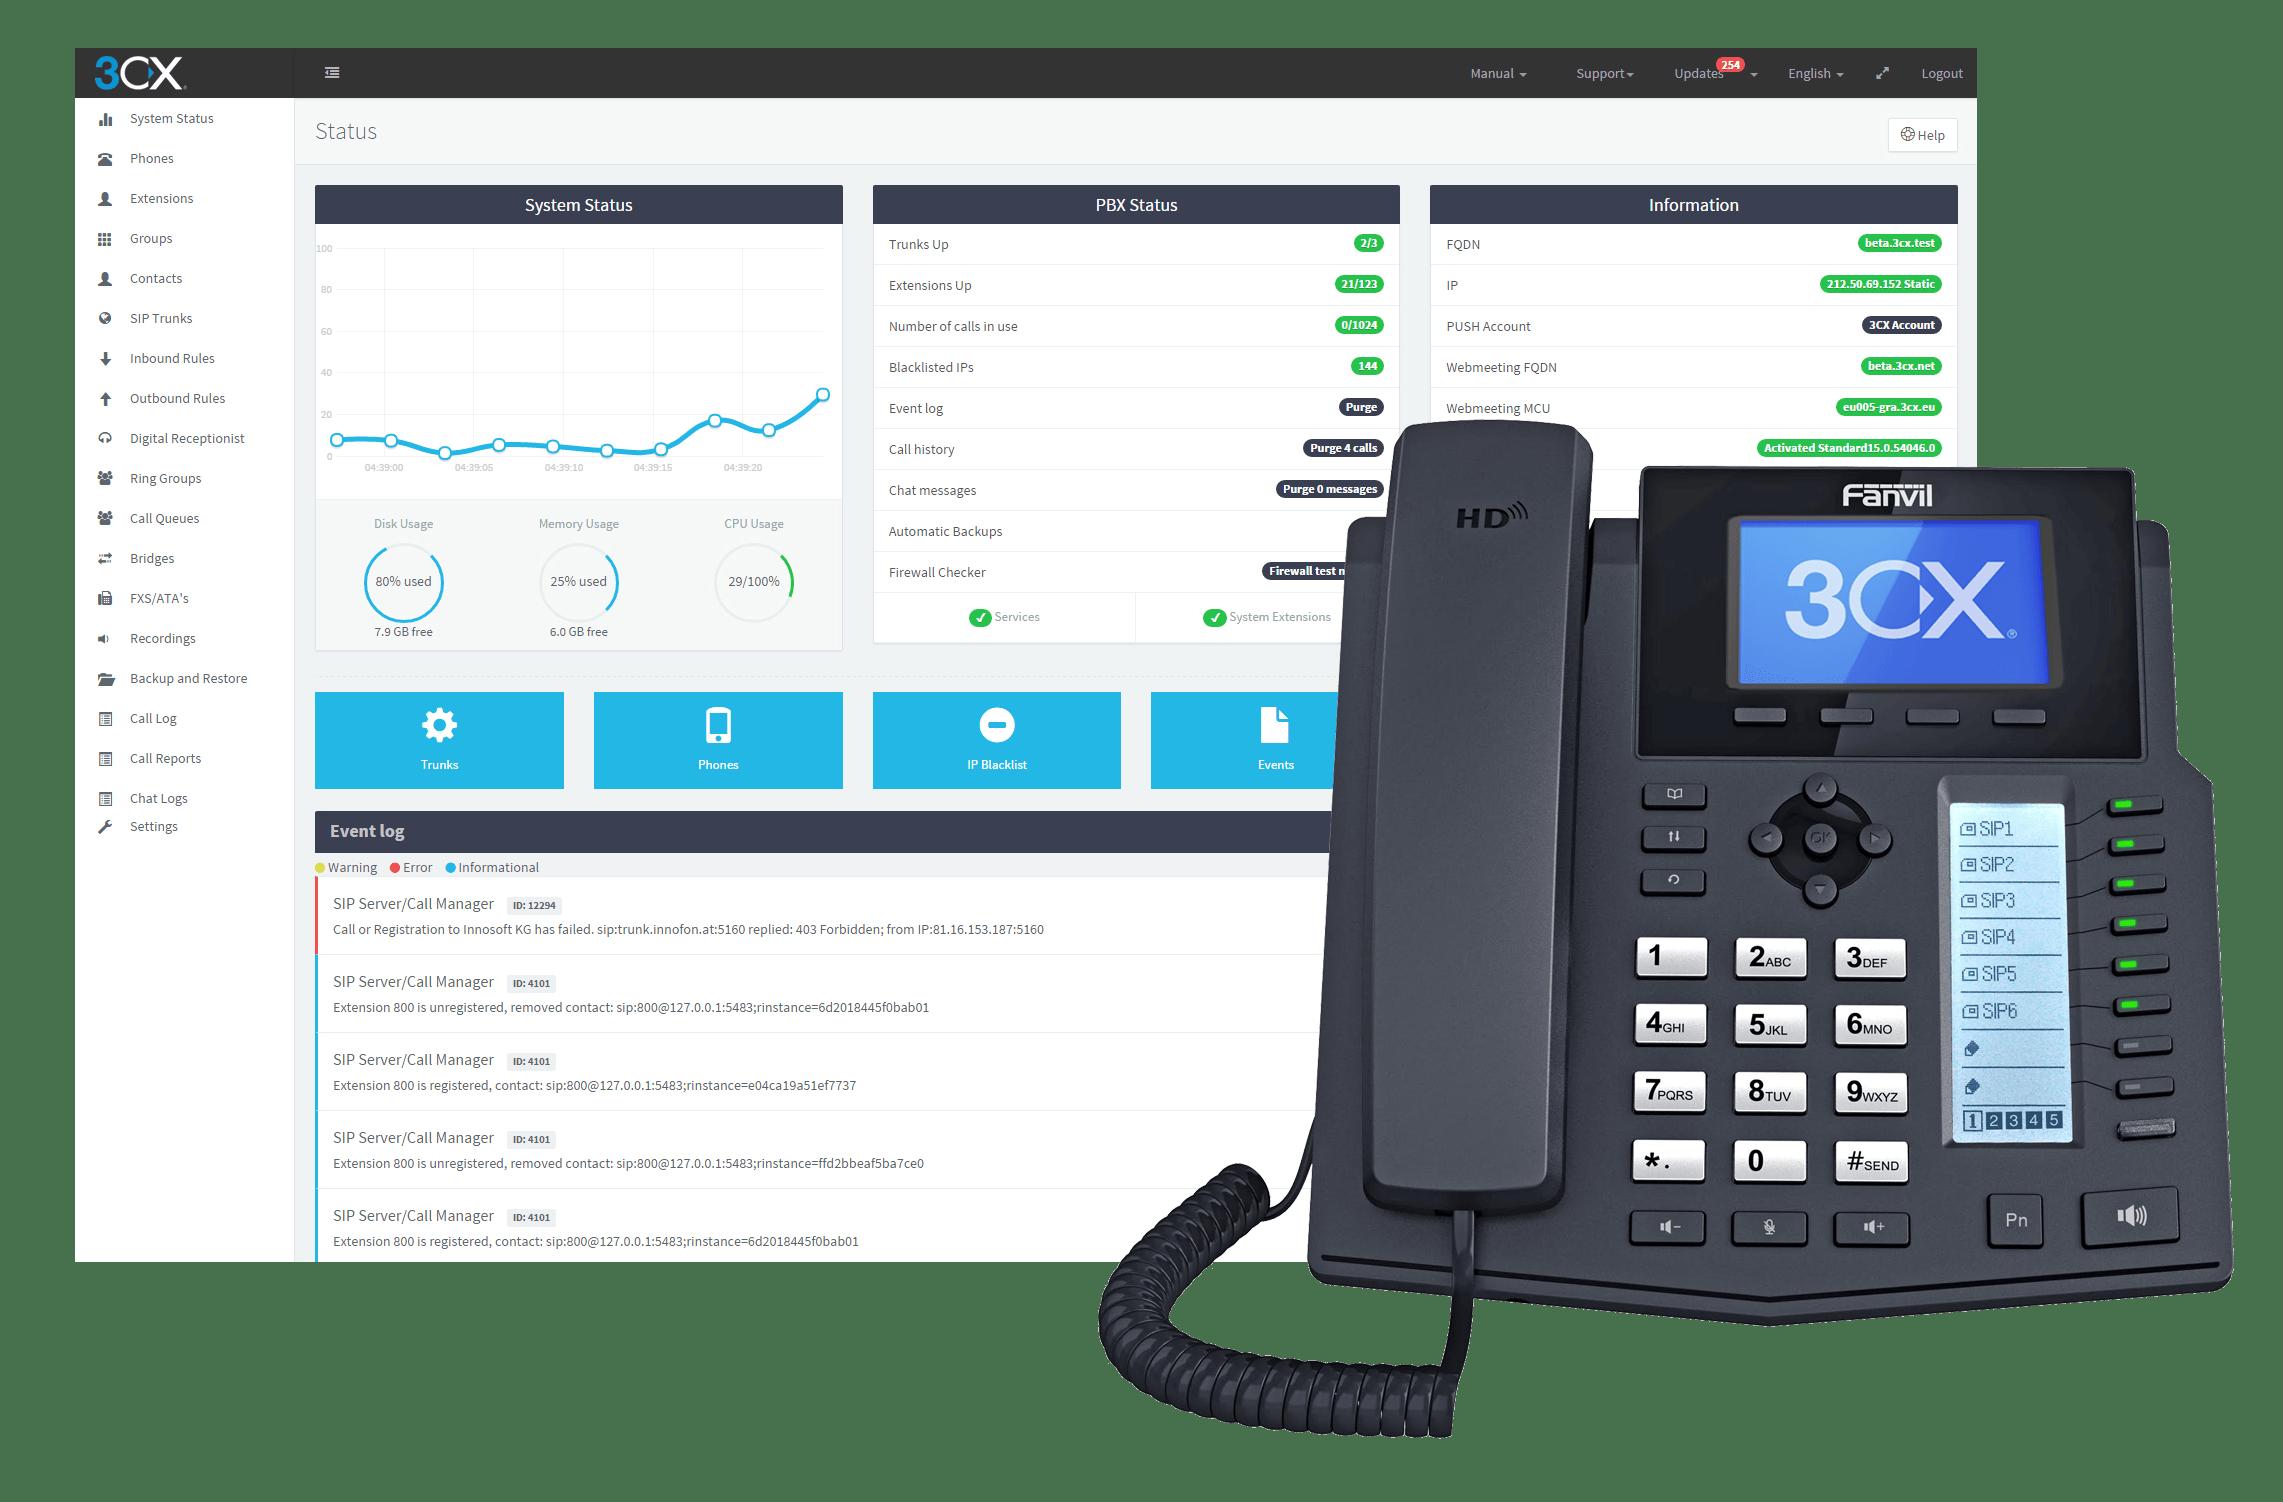 3cx dashboard and phone